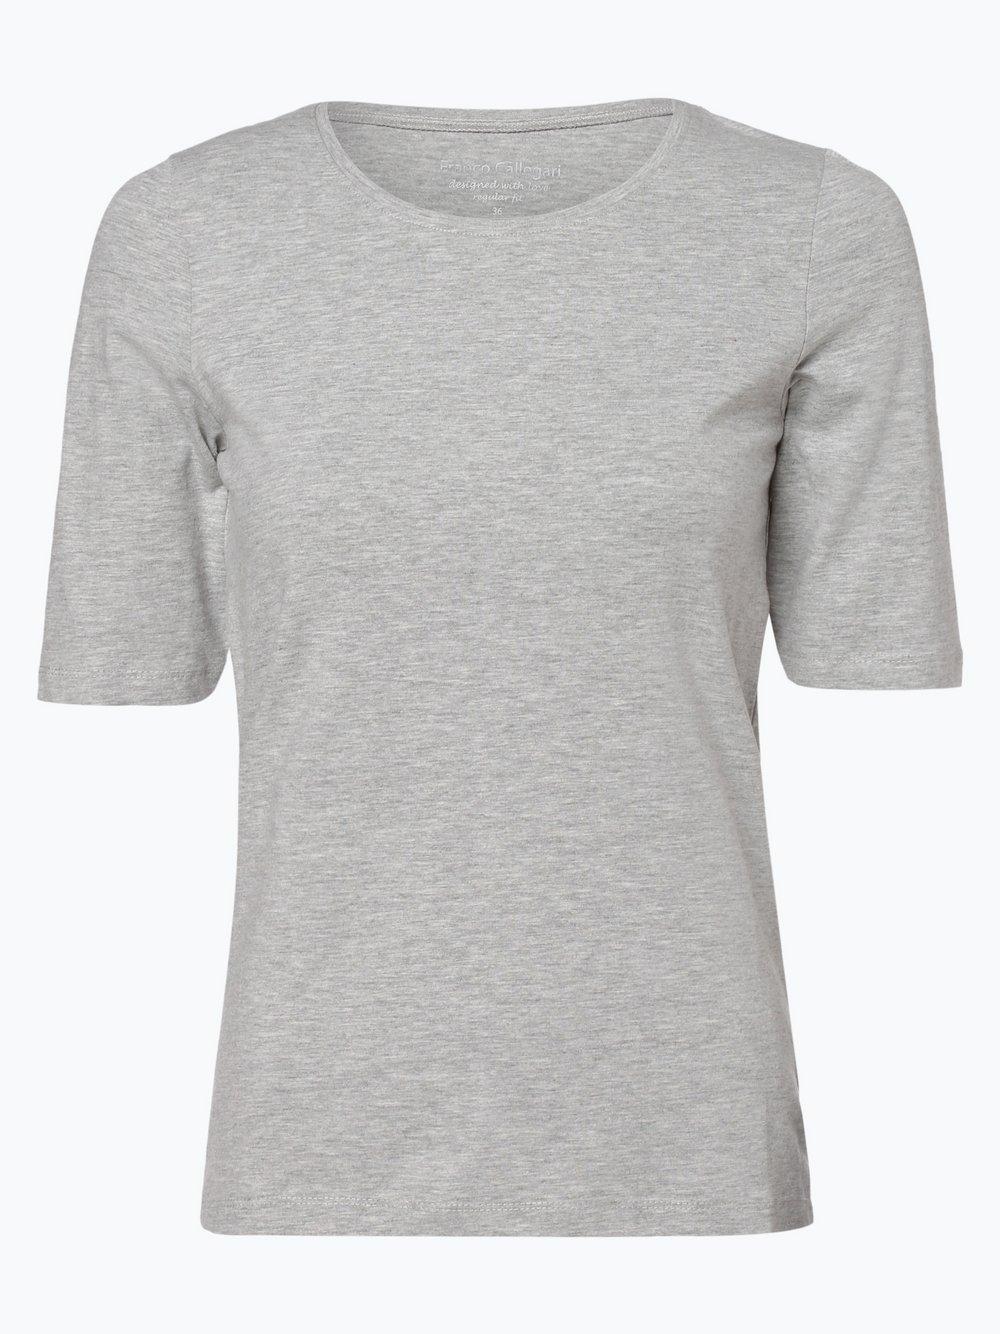 Franco Callegari - T-shirt damski, szary